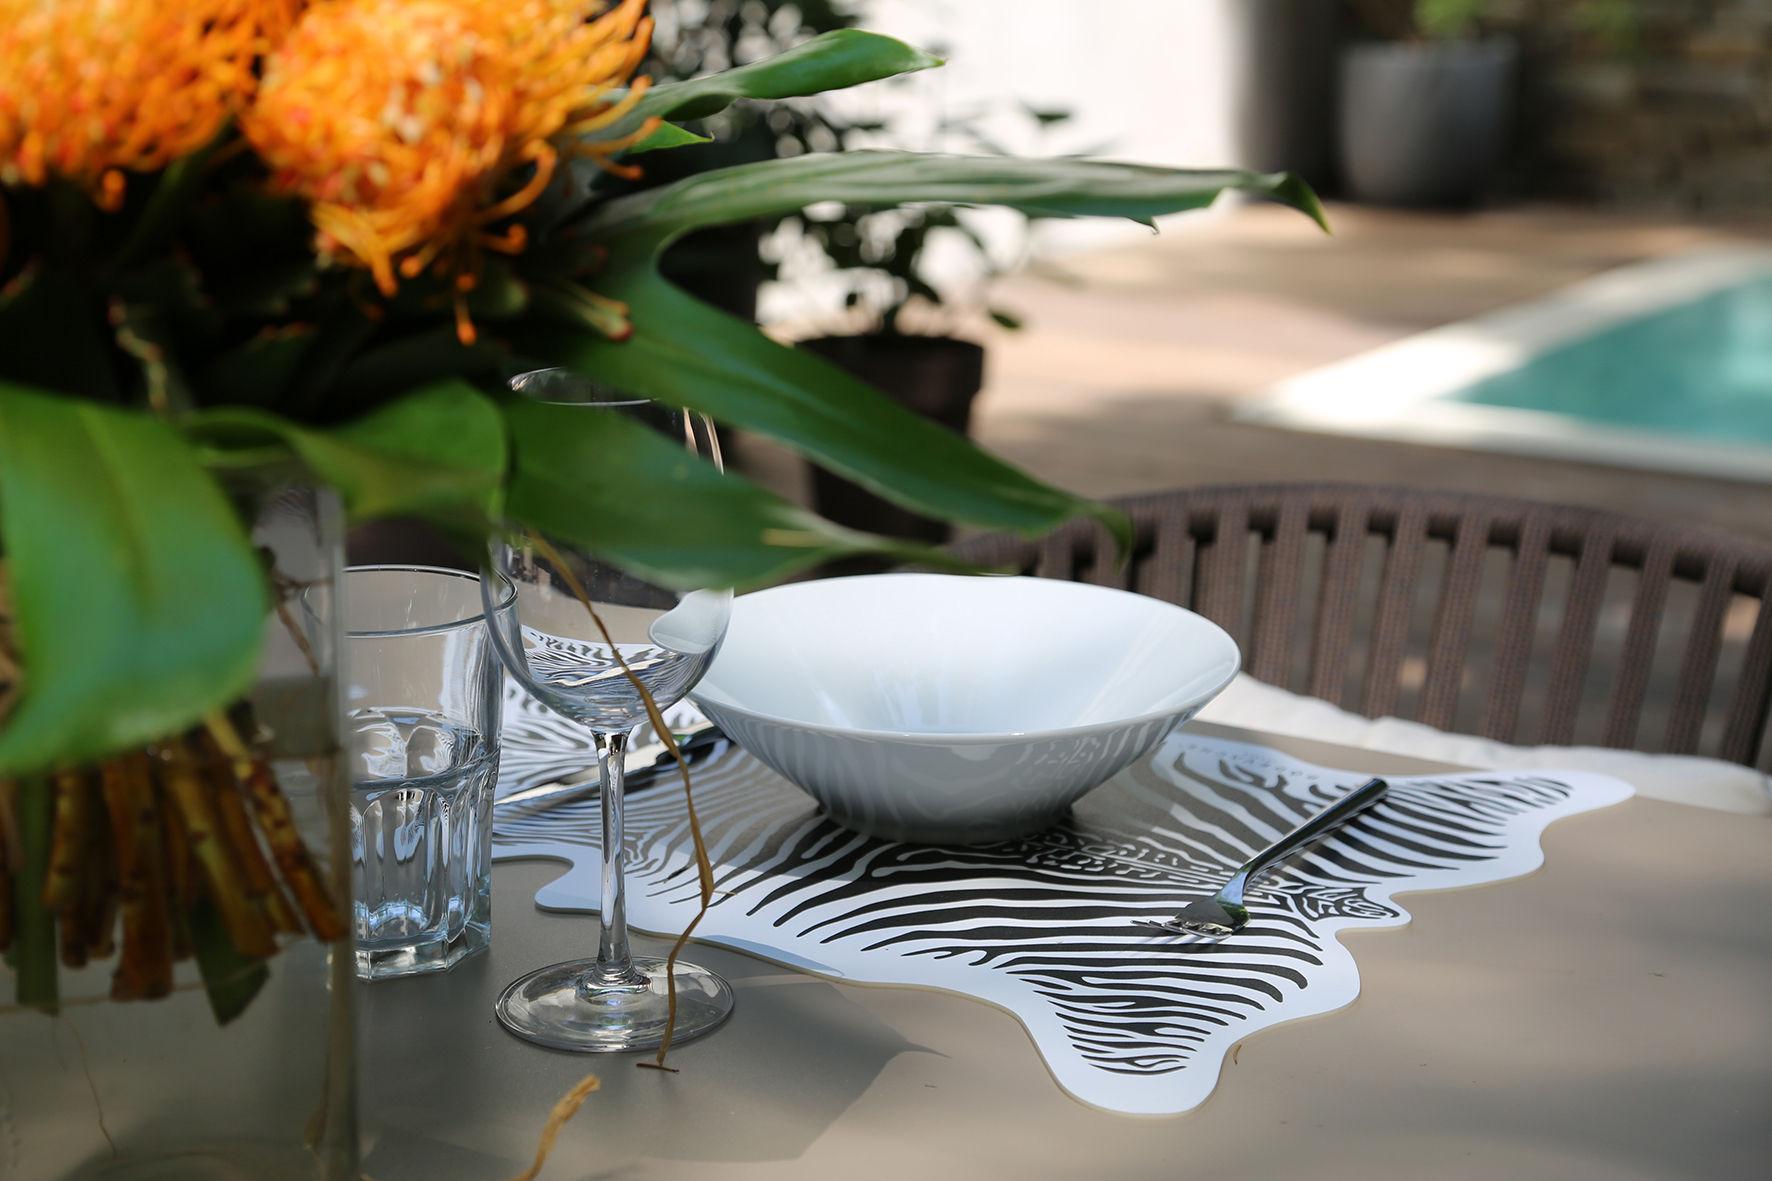 set de table z bre p devache blanc rayures noires made in design. Black Bedroom Furniture Sets. Home Design Ideas